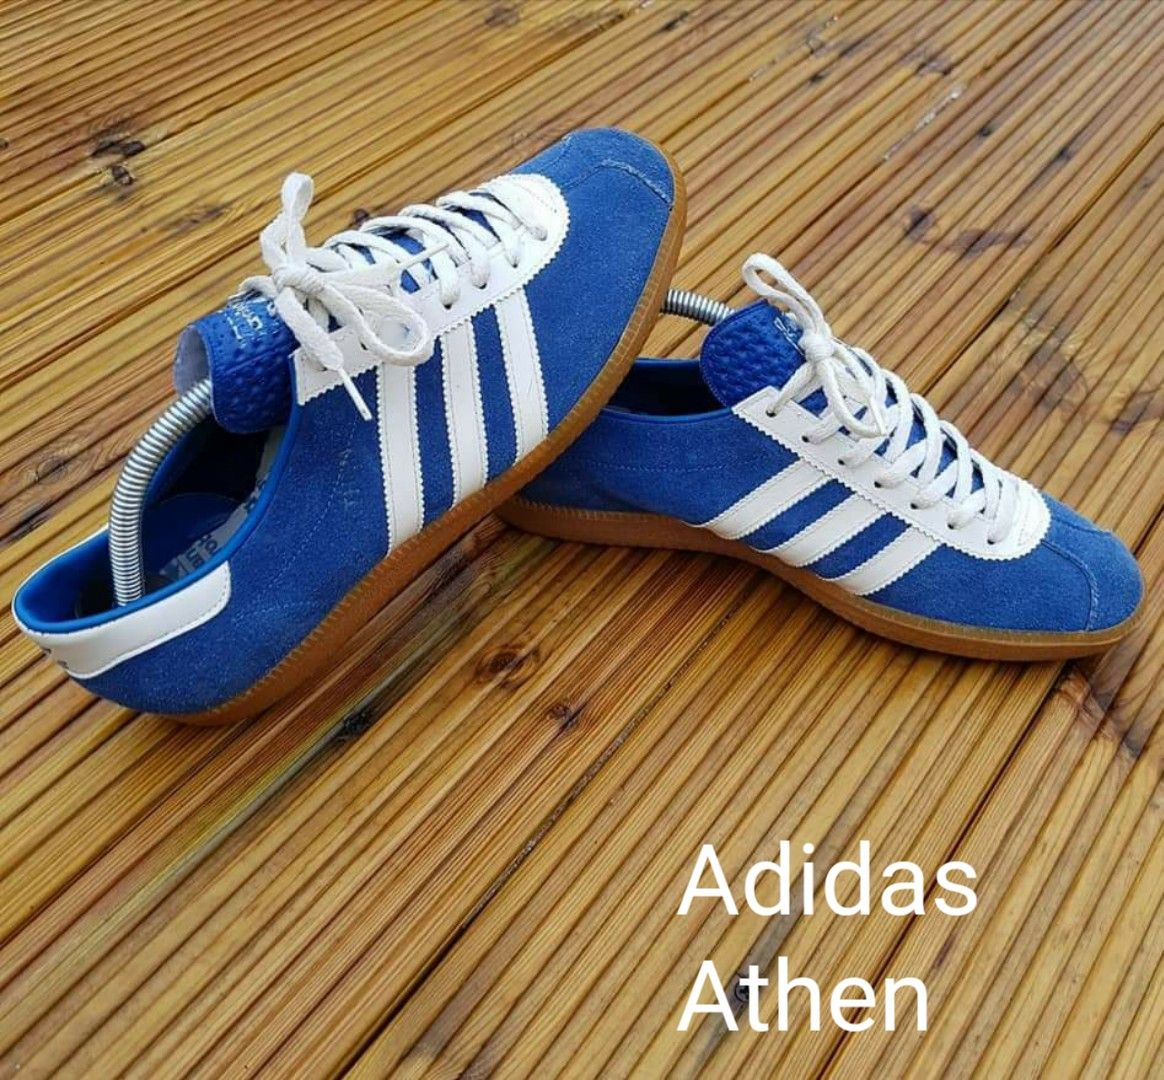 Vintage Adidas Athen stunners!